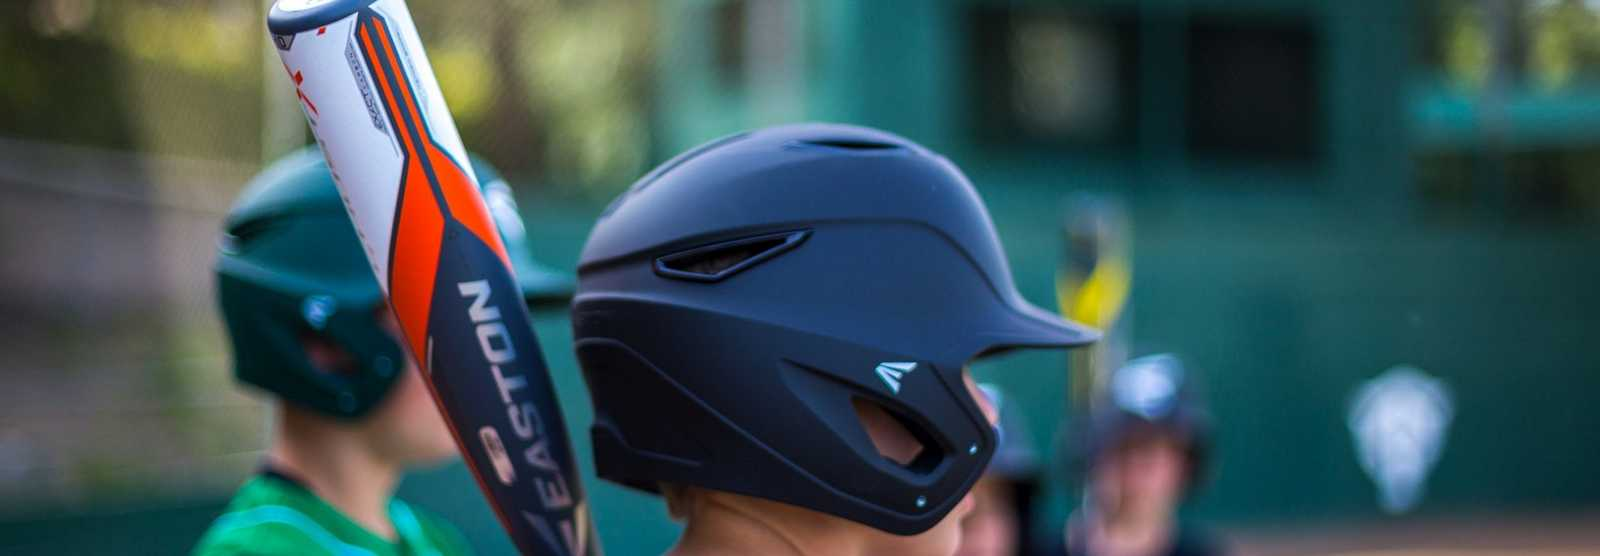 baseball-batting-helmet-accessories